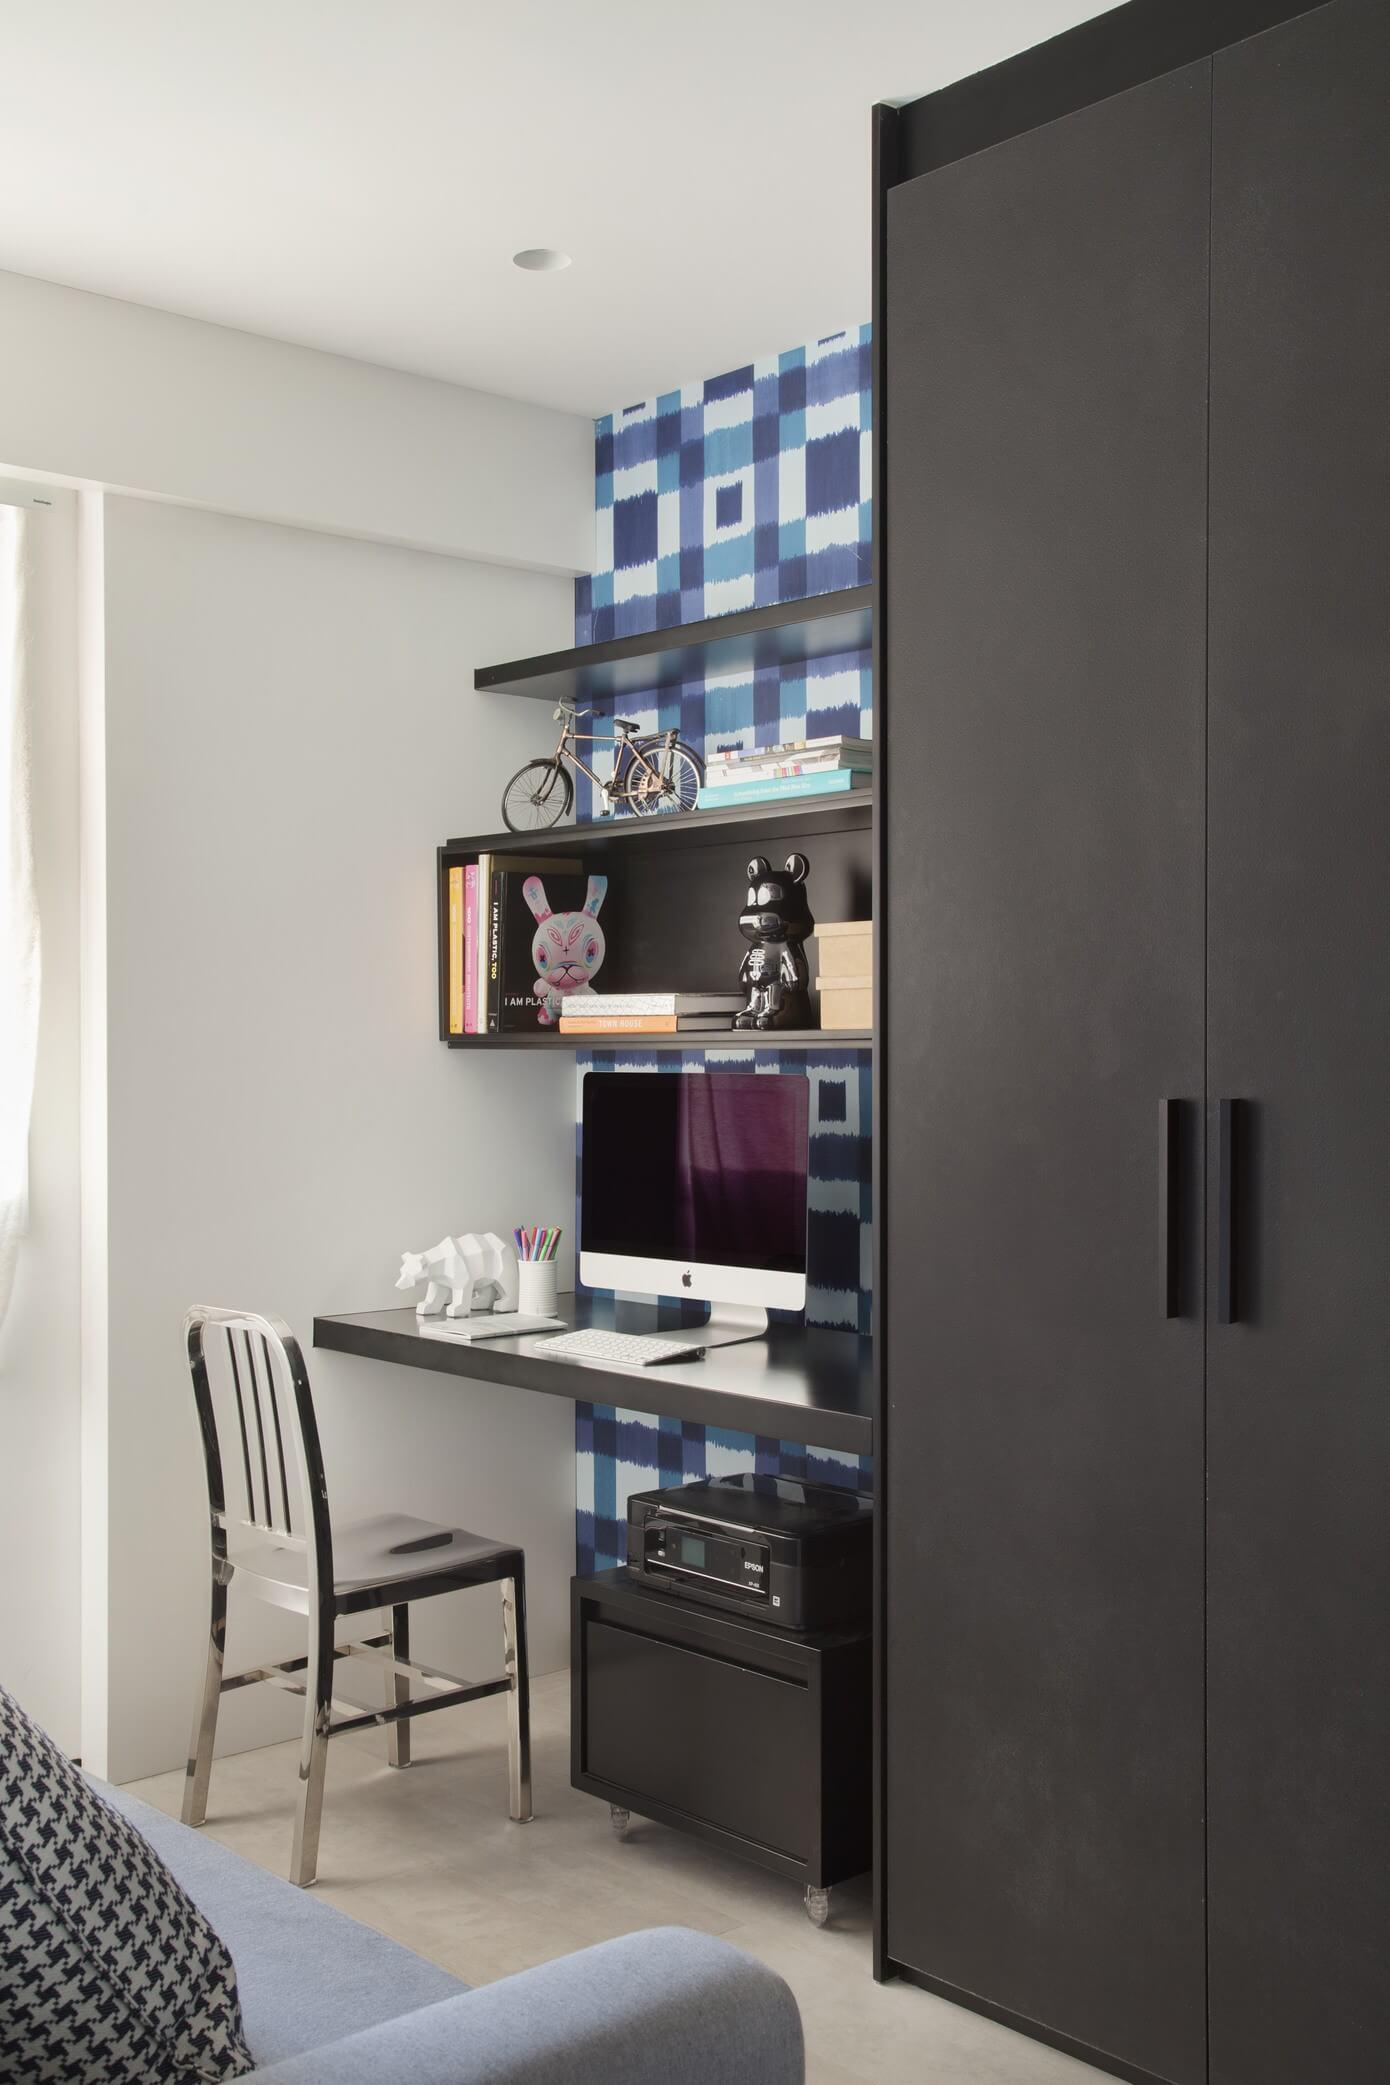 светъл и изчистен двустаен апартамент_roca_11